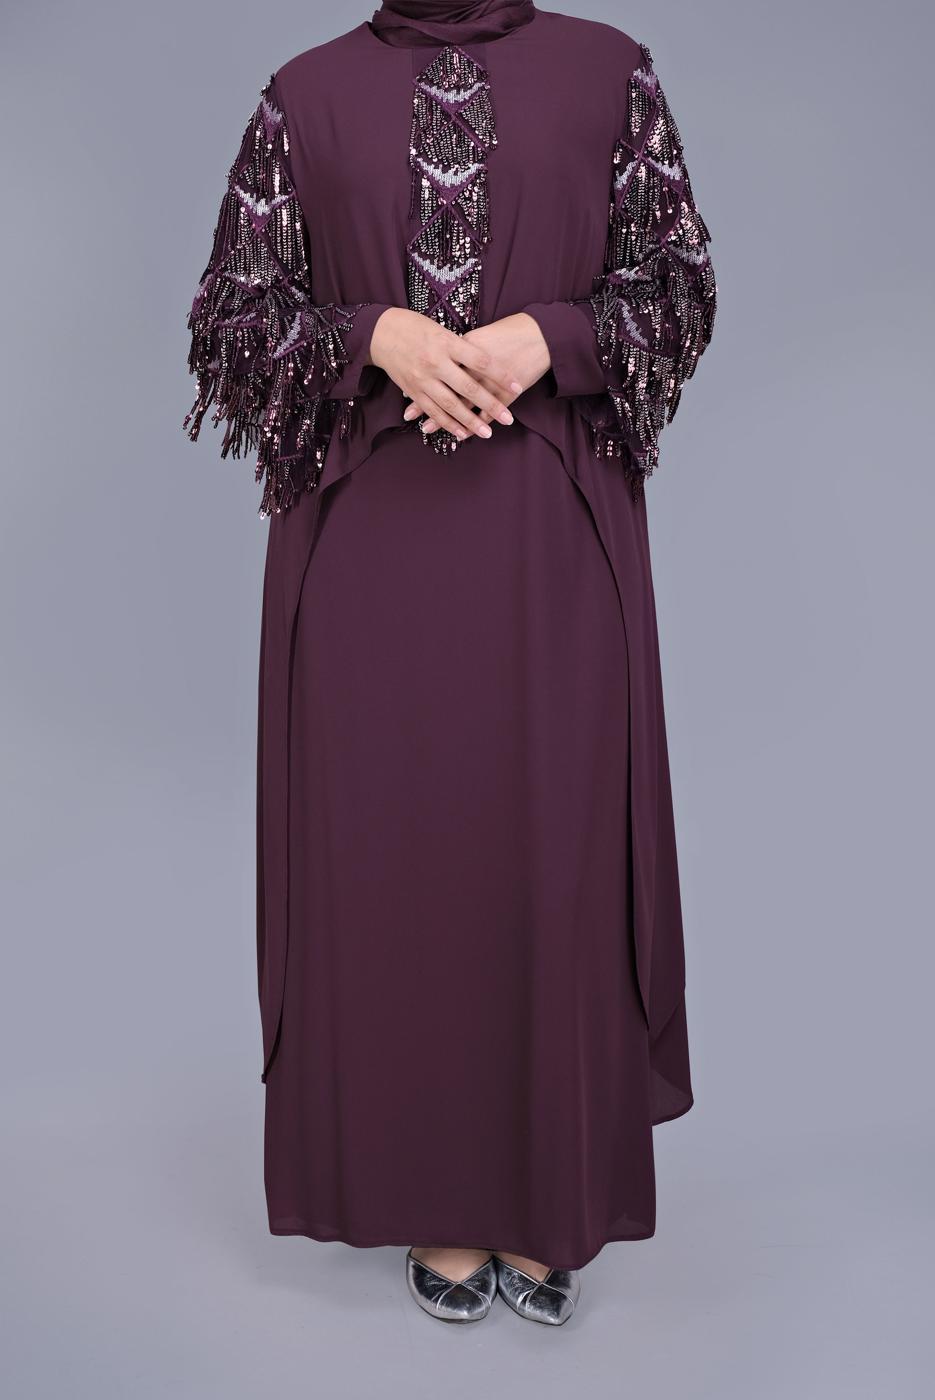 Female Plum 2-PIECE EVENING DRESS 5602